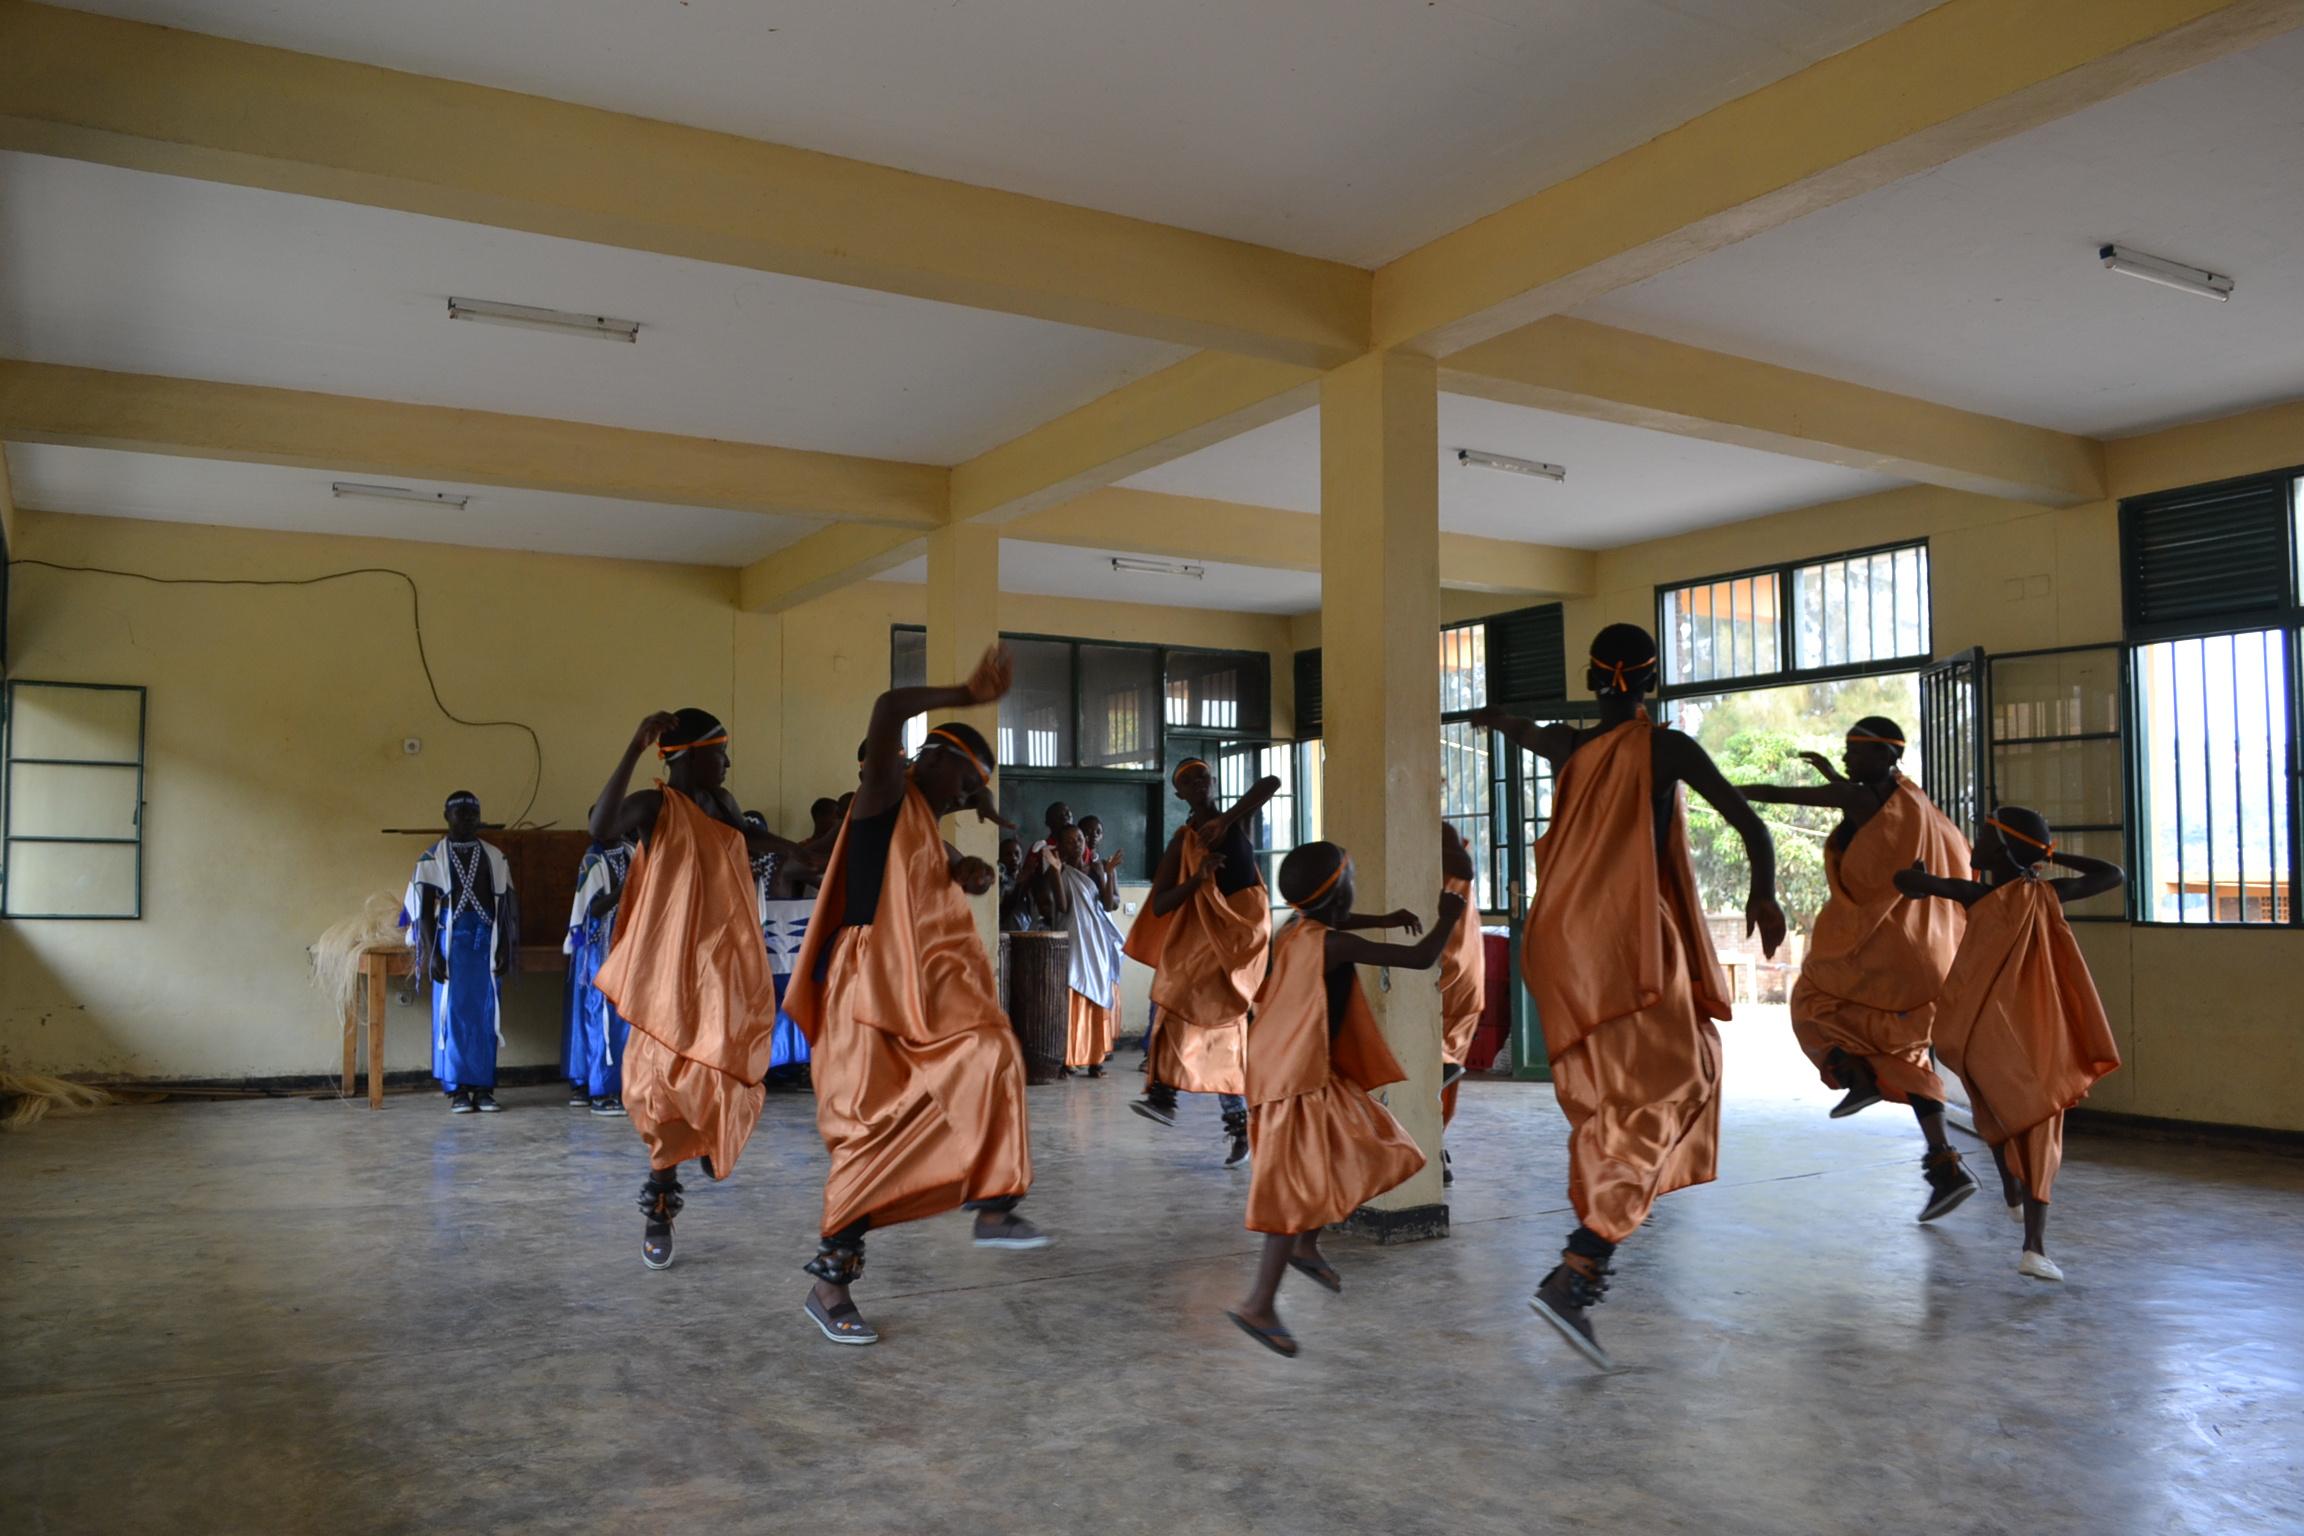 Rwandan girls telling stories through traditional dance